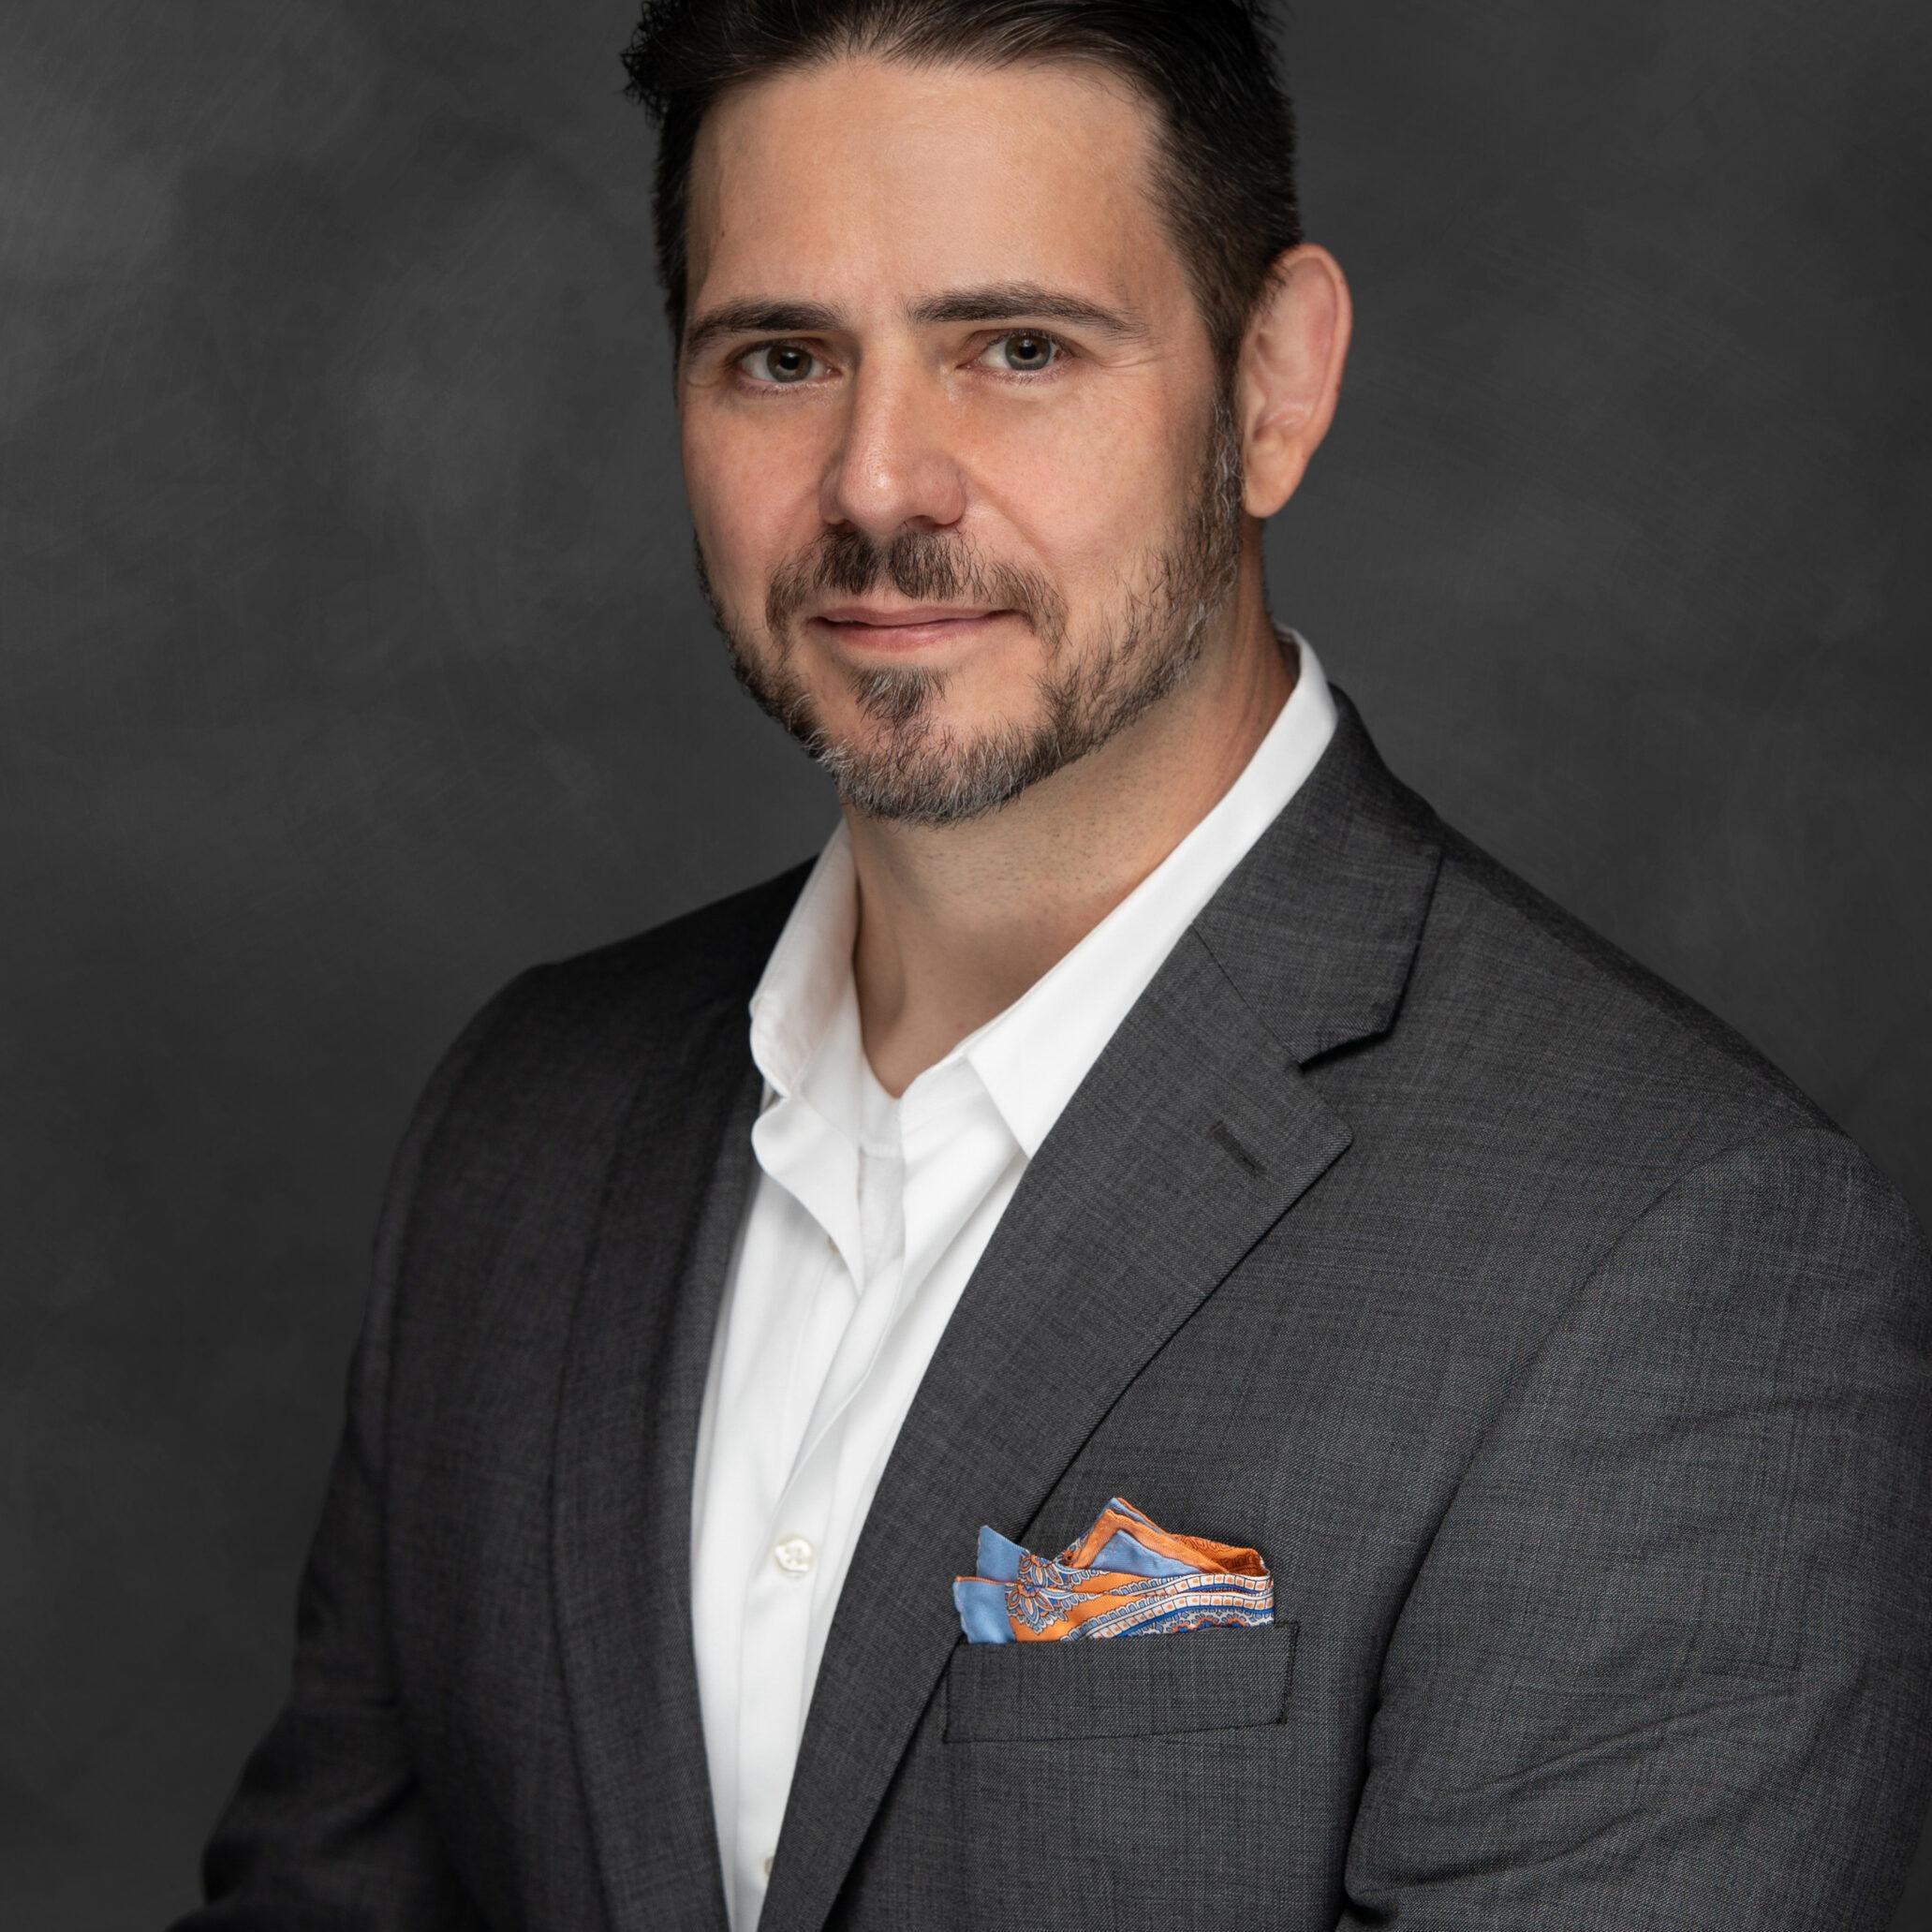 Corporate headshot of WJ Weaver